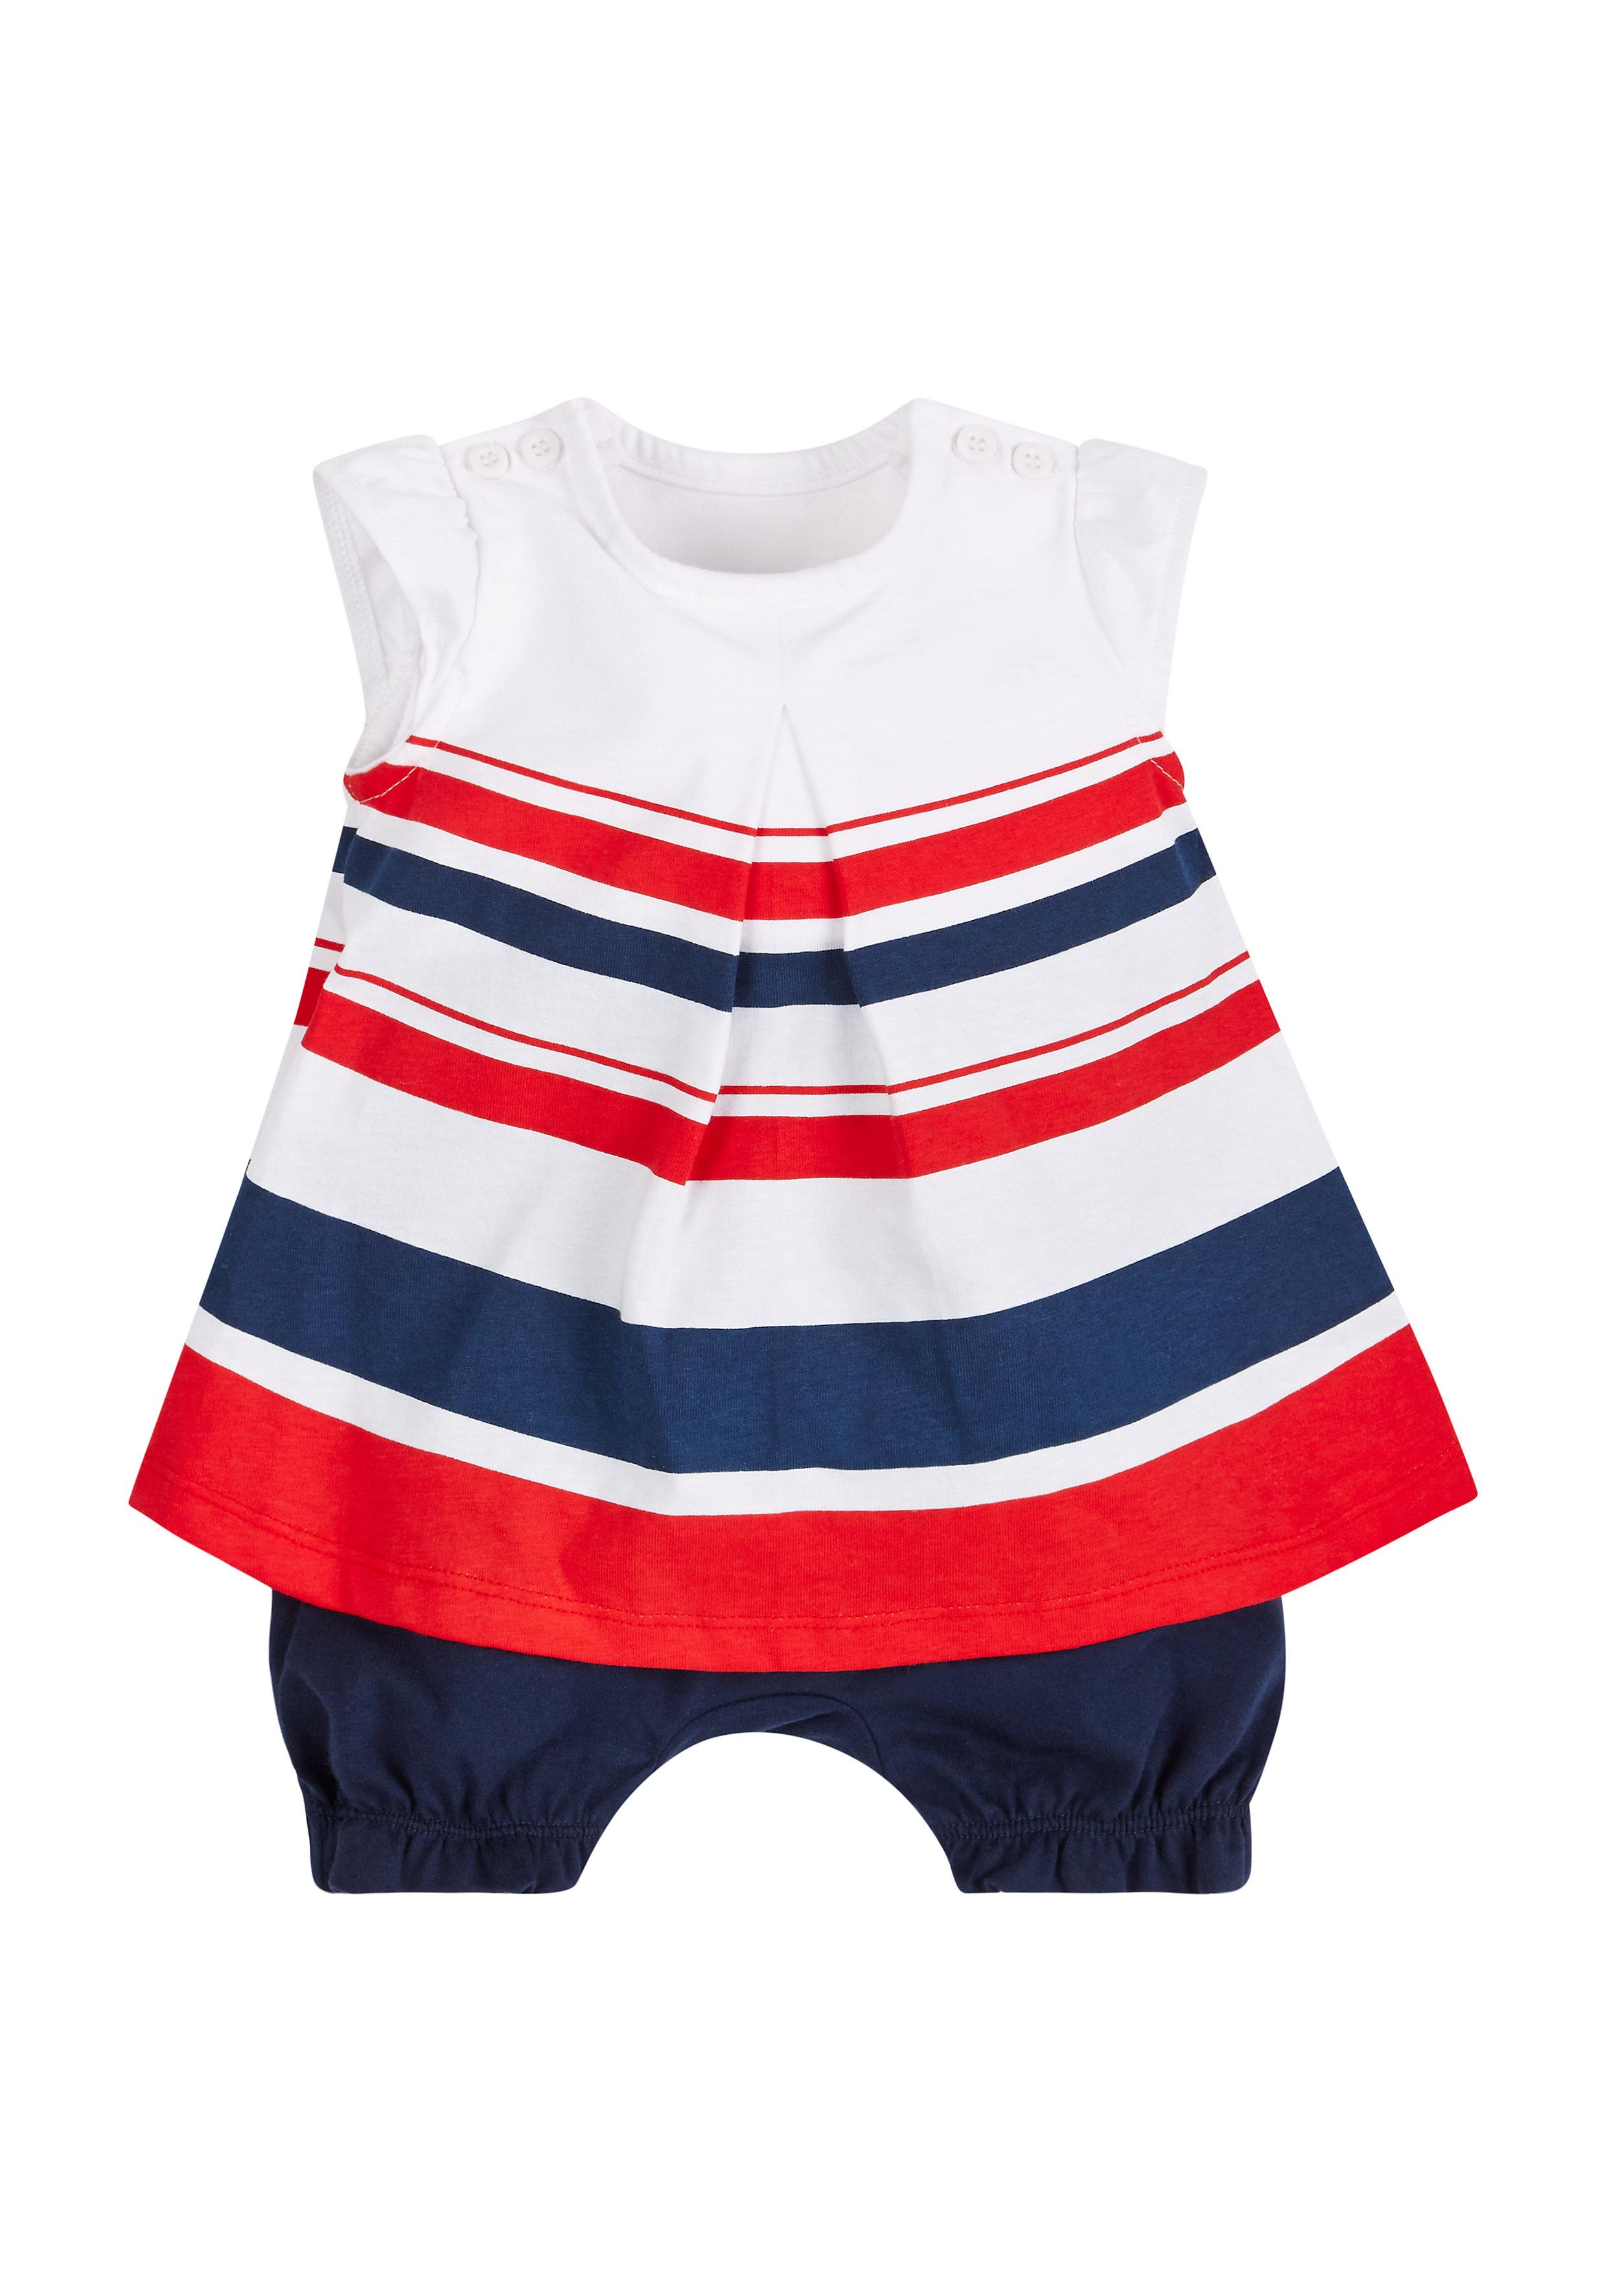 Mothercare | Girls Nautical Striped Romper Dress